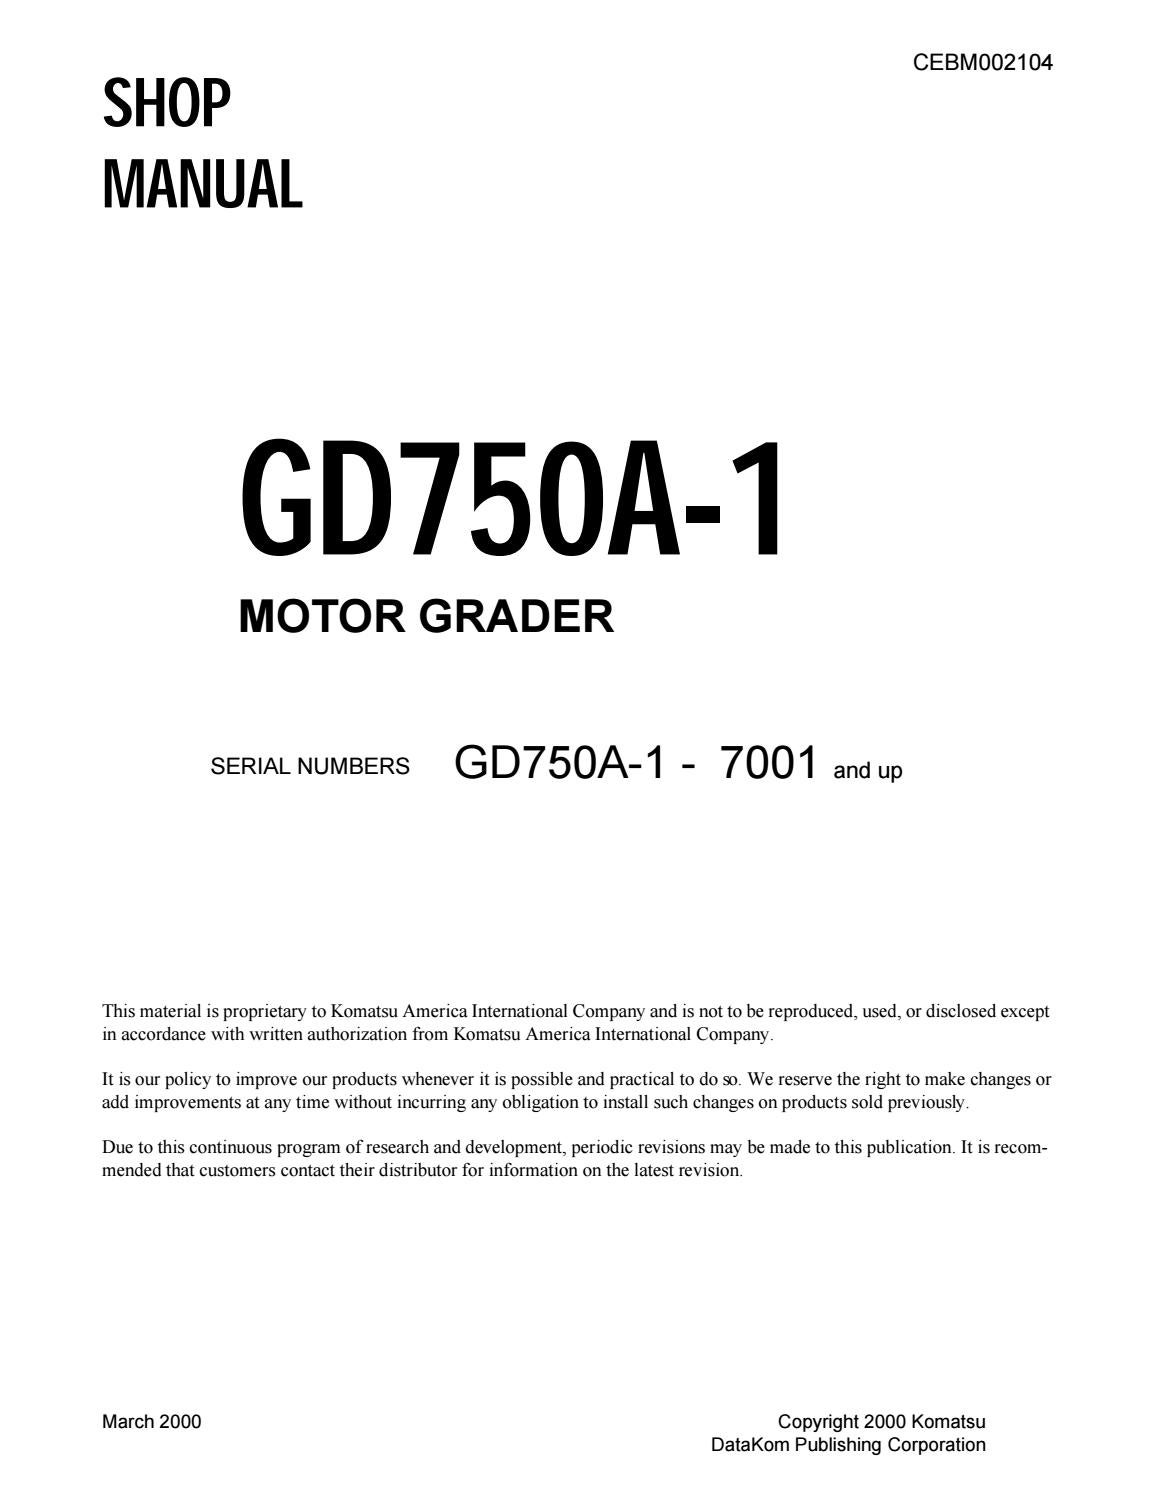 komatsu gd750a 1 motor grader shop